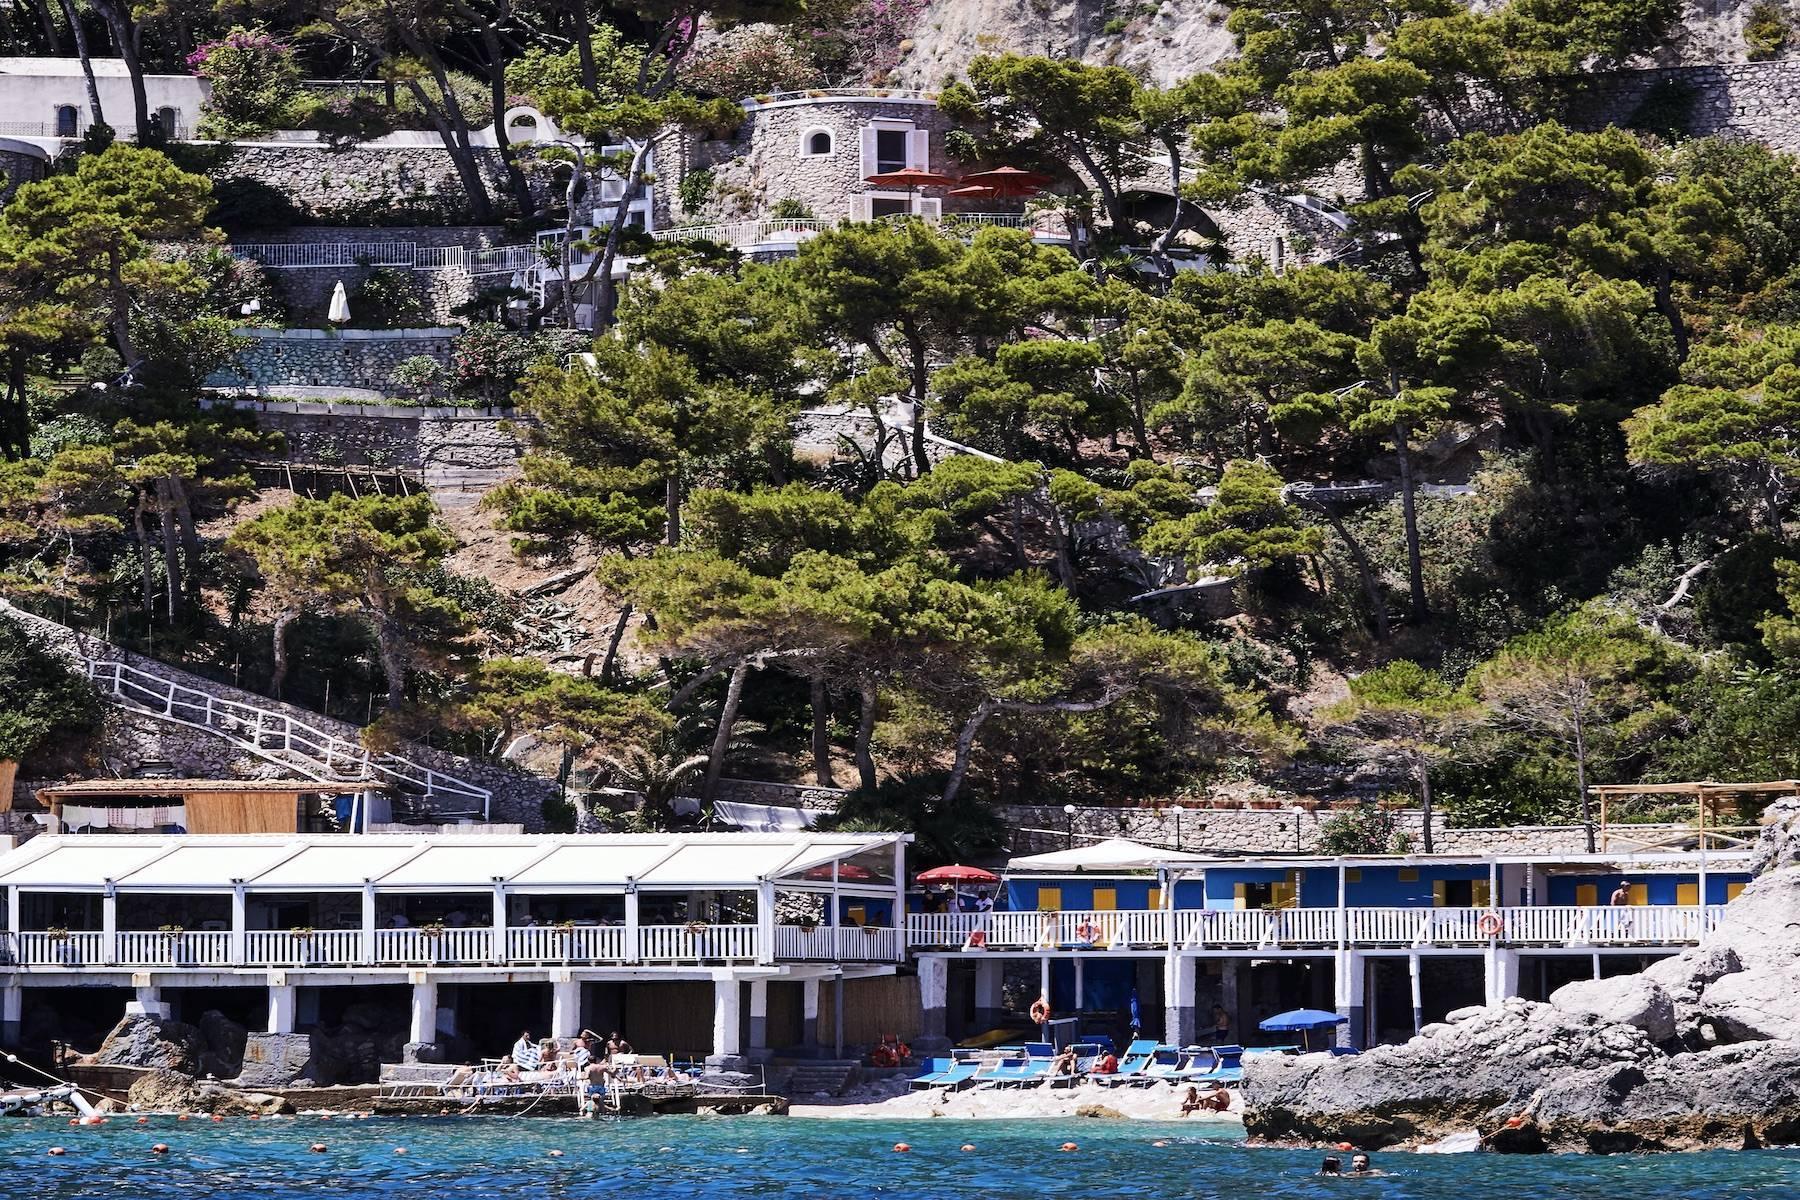 Pied-dans-l'eau Villa in Capri - 4